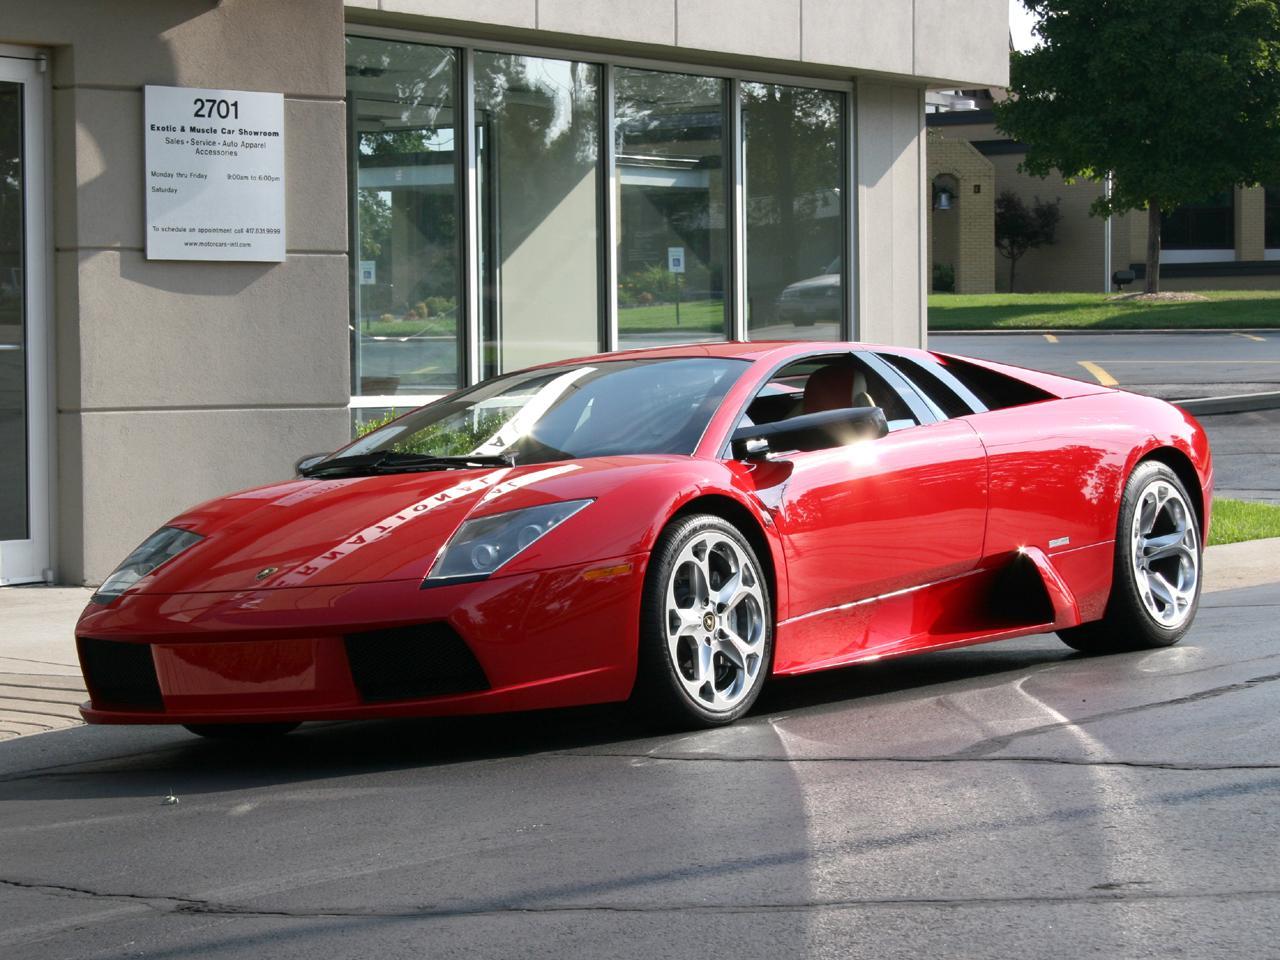 2005 Lamborghini Murcielago E Gear